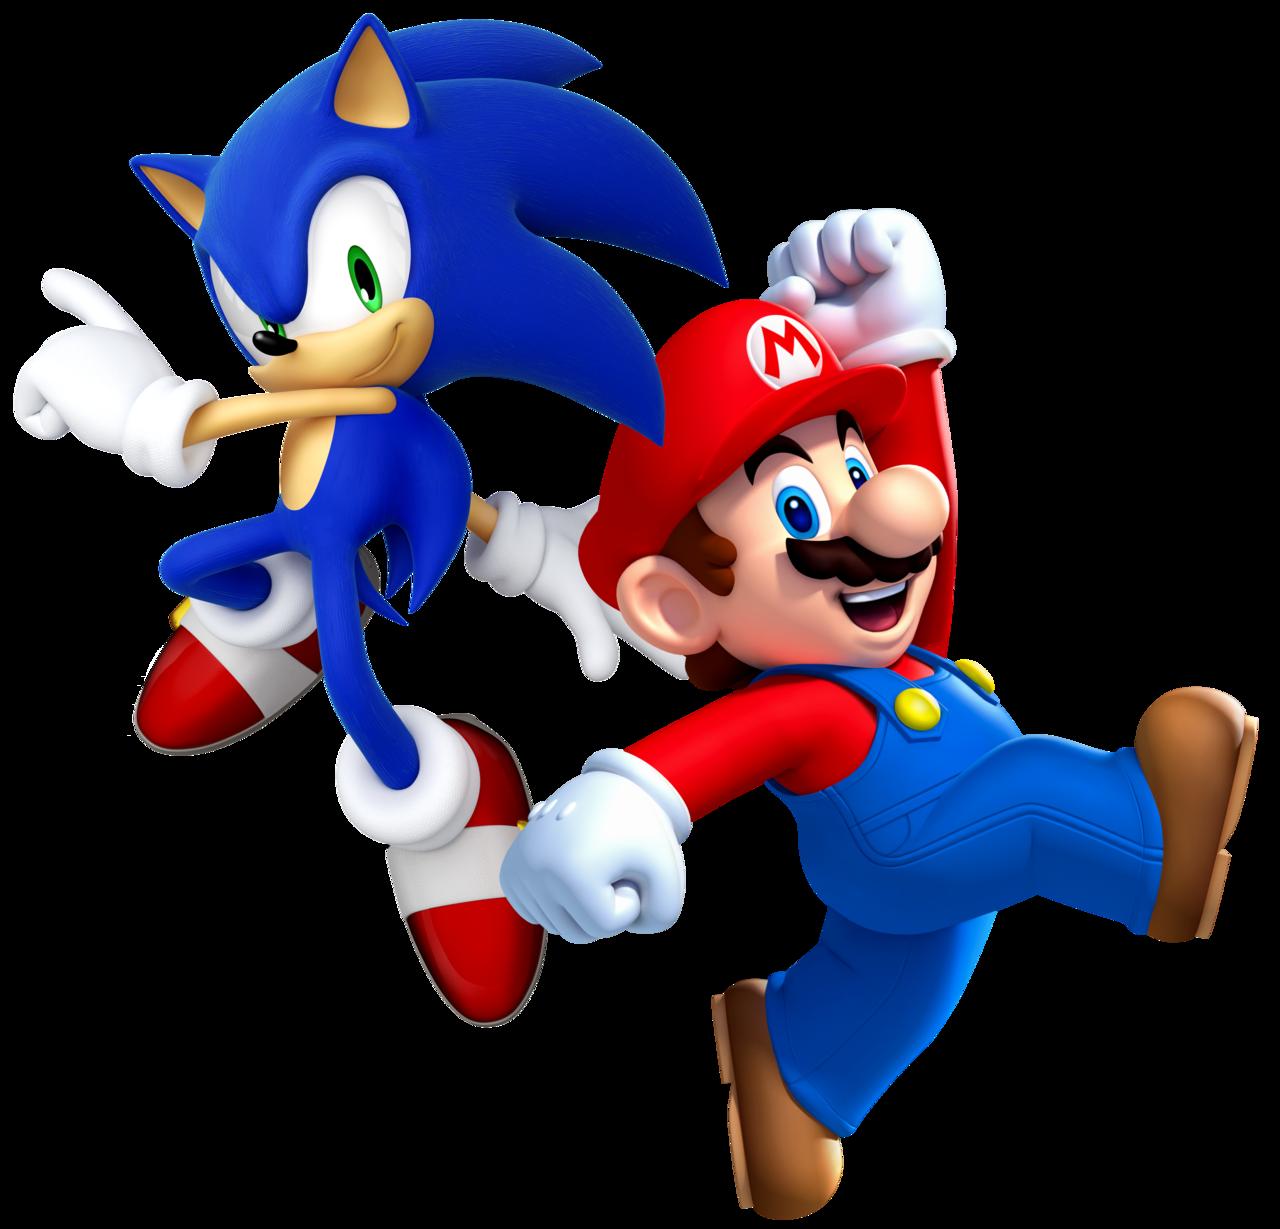 Coloriage Mario Et Sonic A Imprimer